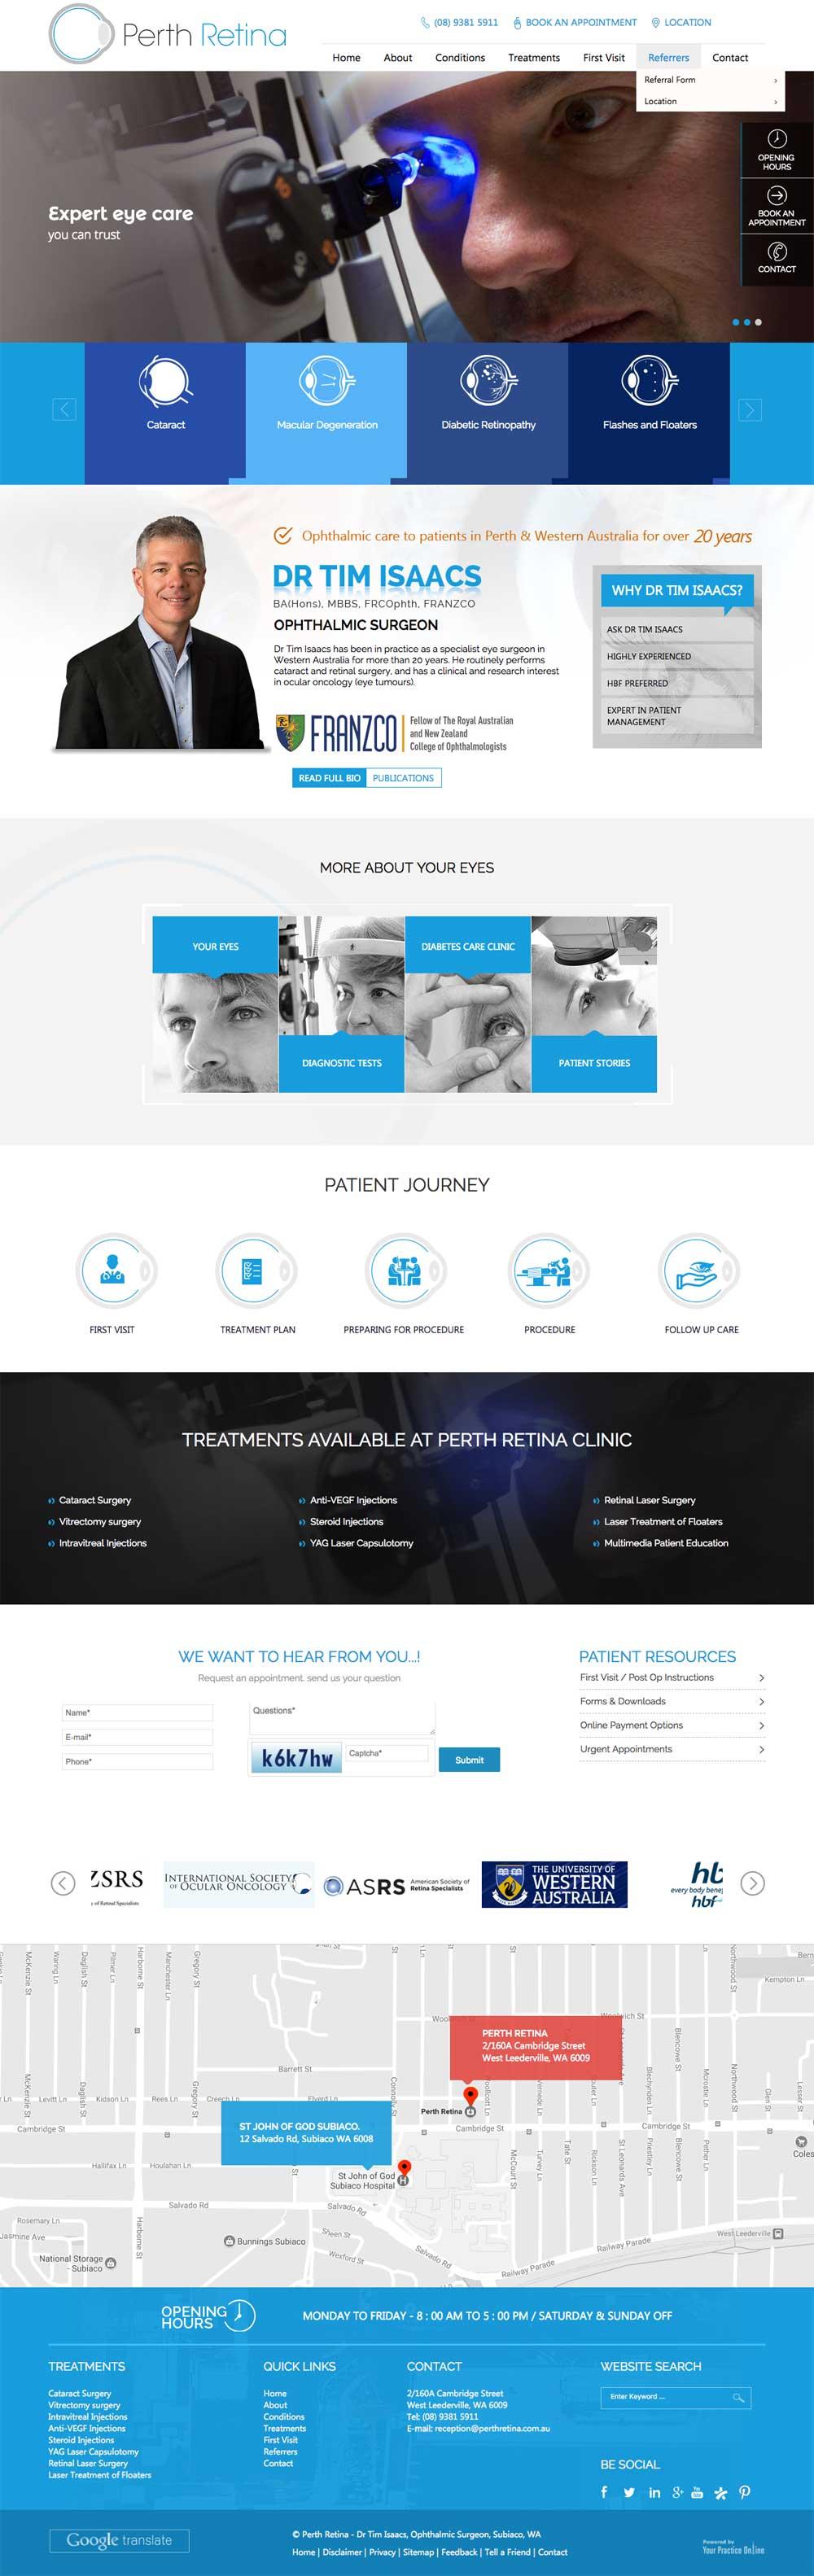 Perth-Retina---Dr-Tim-Isaacs--Ophthalmic-Surgeon--Subiaco--WA.jpg